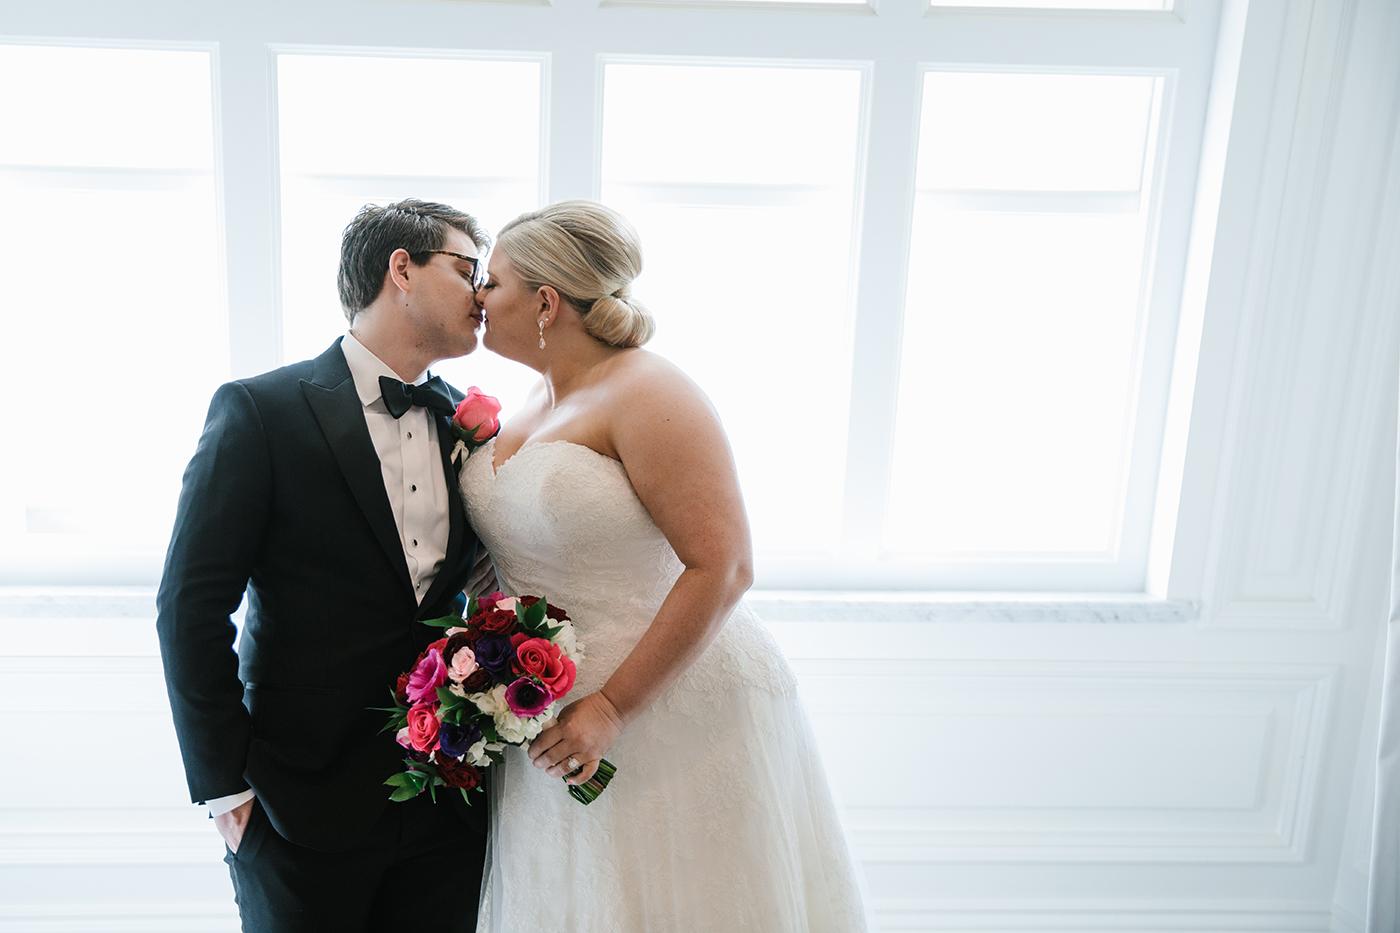 Dallas Weddings Planner - Allday Events - Katie + Matthew at The Adolphus Hotel - 193.jpg